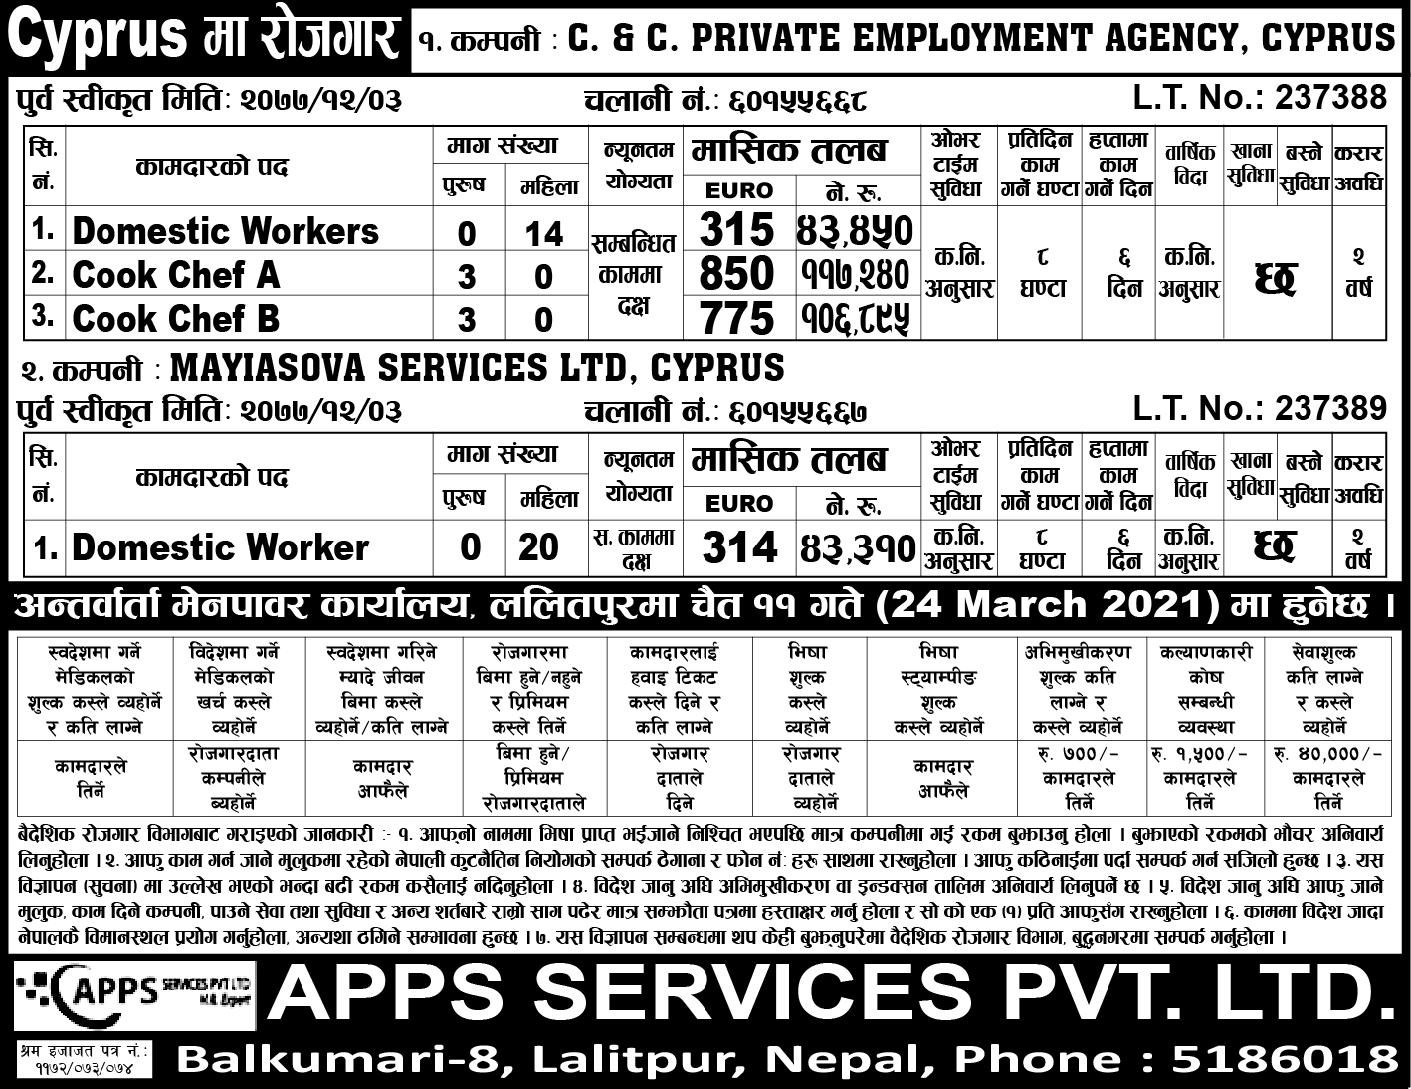 Cyprus job for Nepali